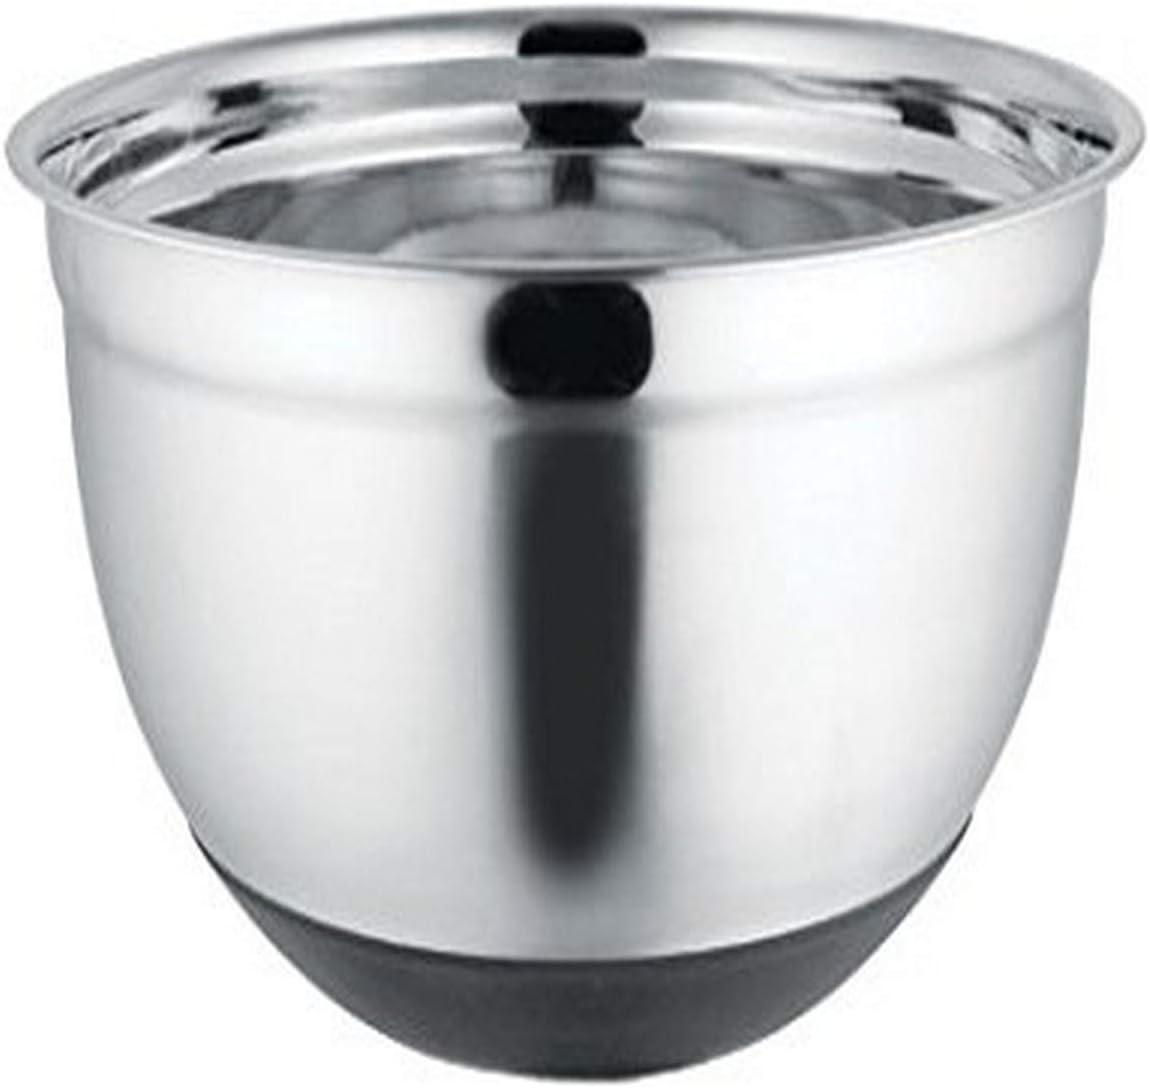 HOME BASICS Mixing Bowl with Anti-Skid Bottom